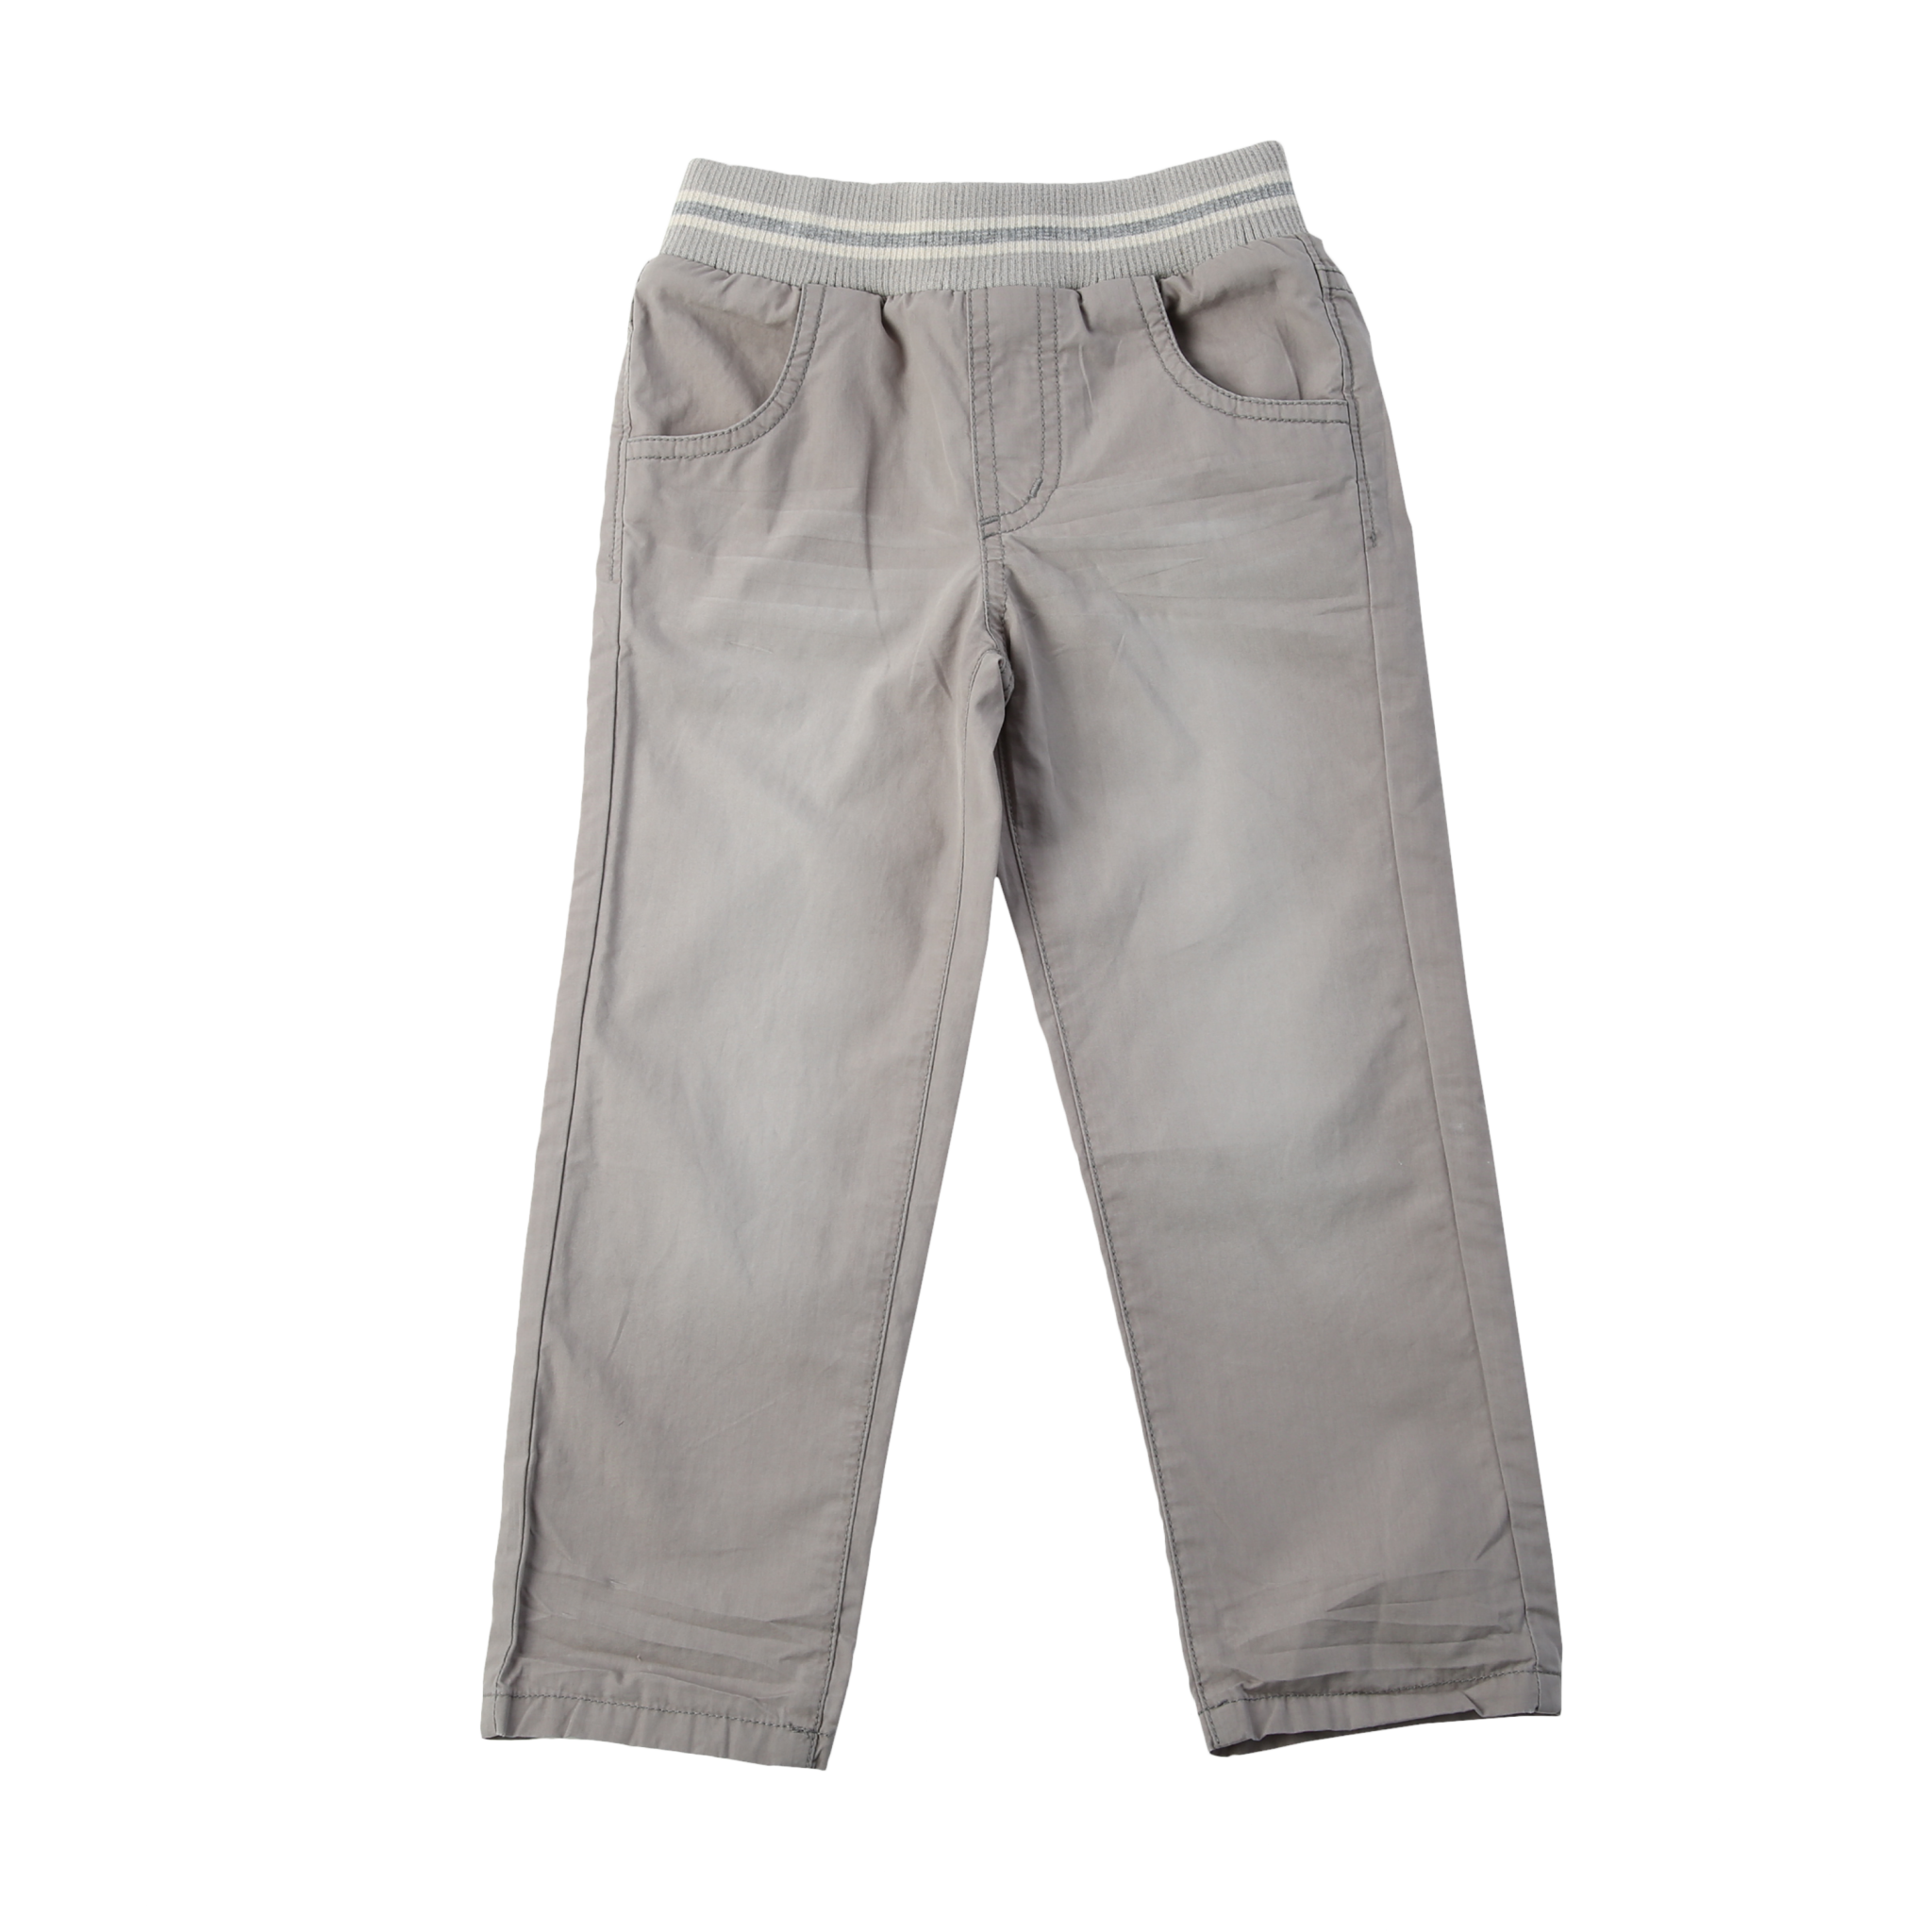 Khaki Pants PNG - 43430